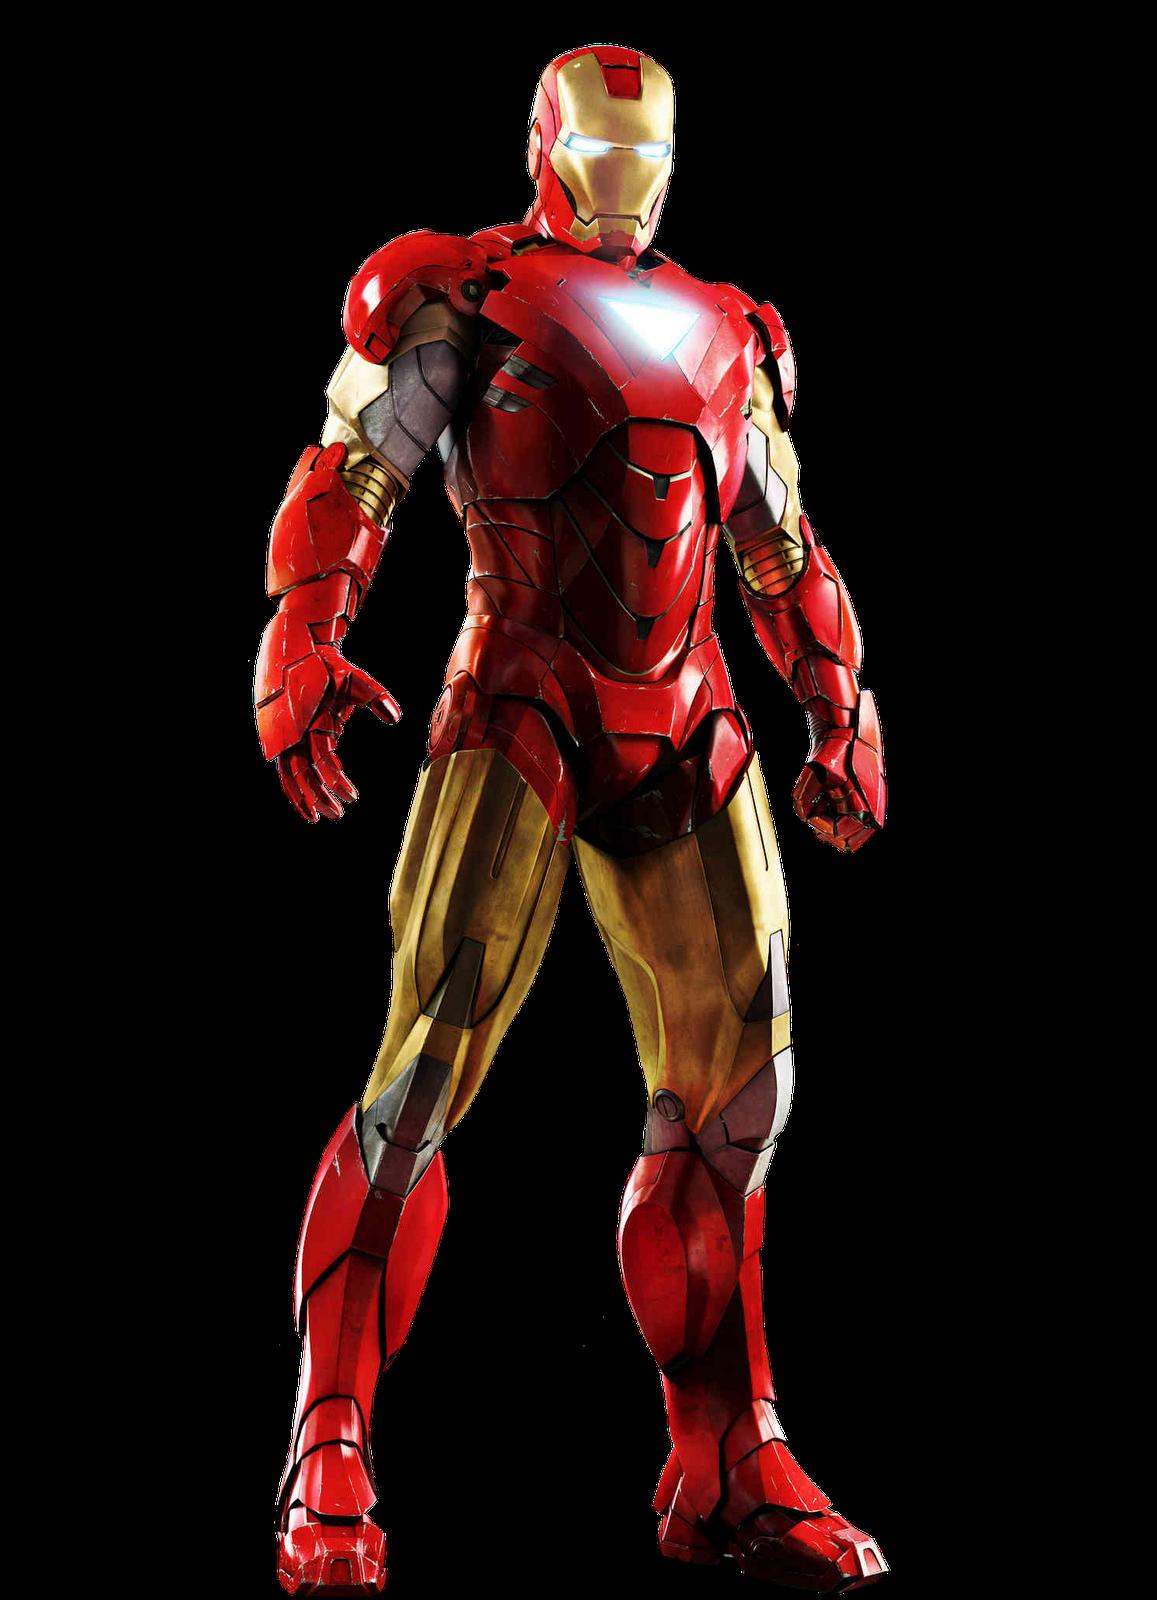 Image Iron Man Renderpng Disney Wiki FANDOM powered by Wikia